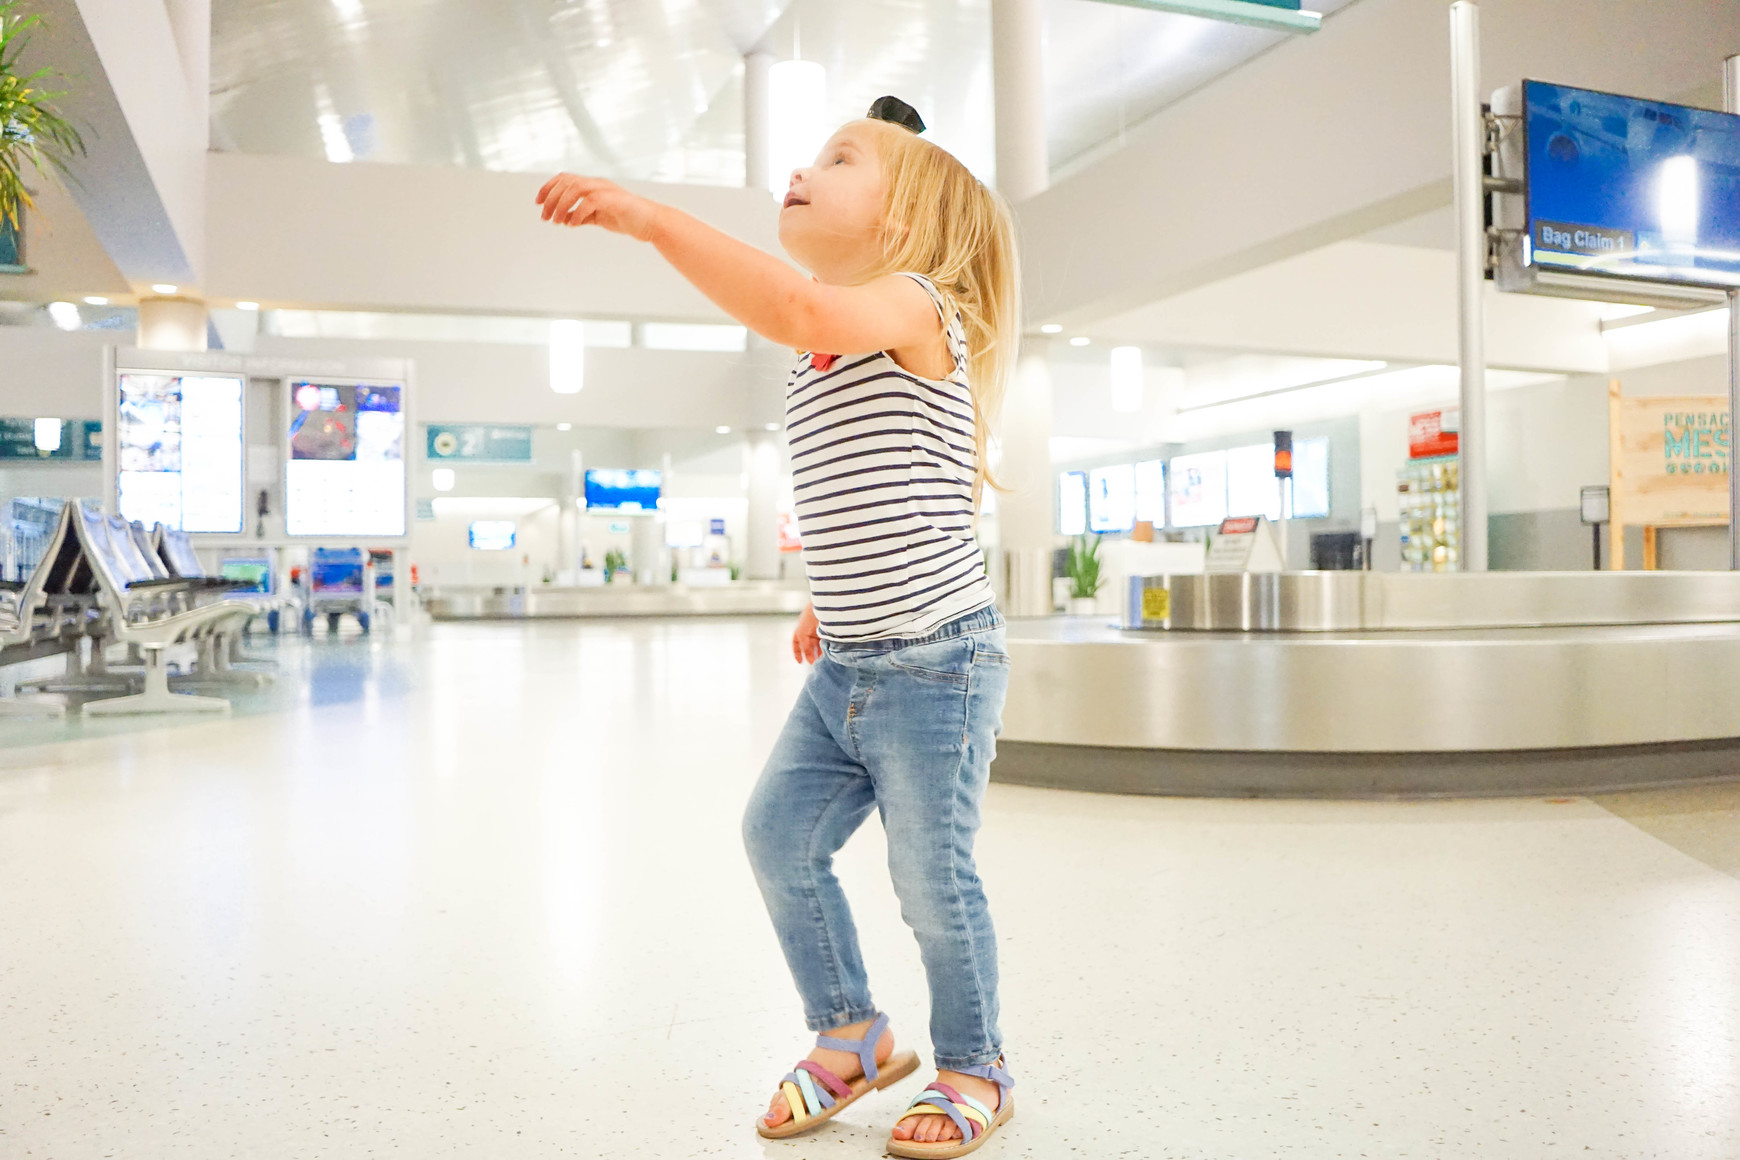 Charletta running through the pensacol airport